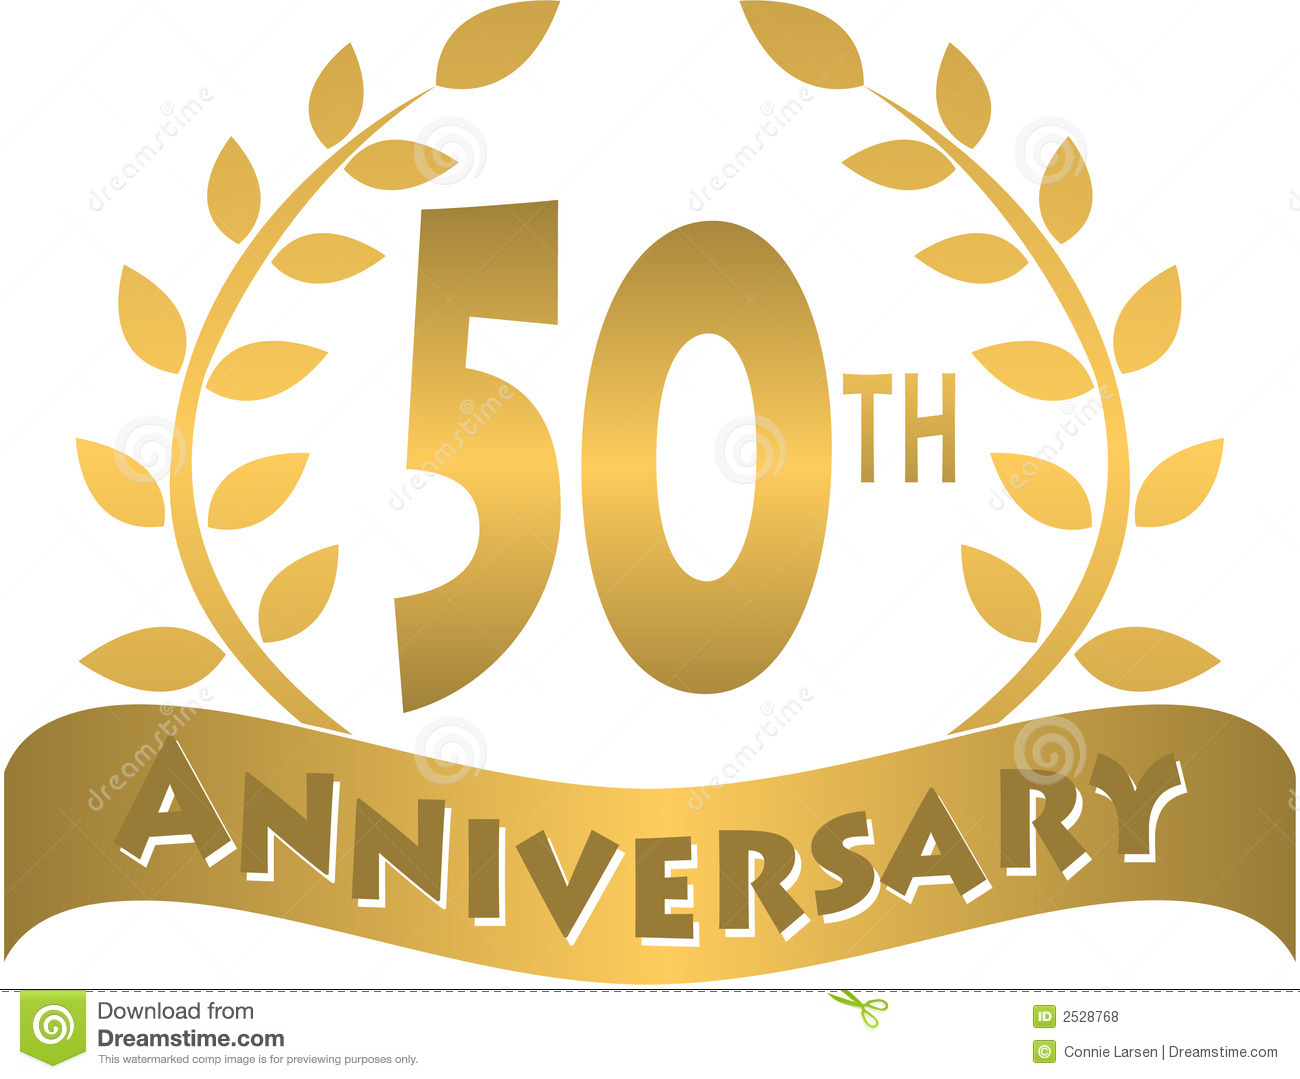 PNG HD 50Th Wedding Anniversary - 129480